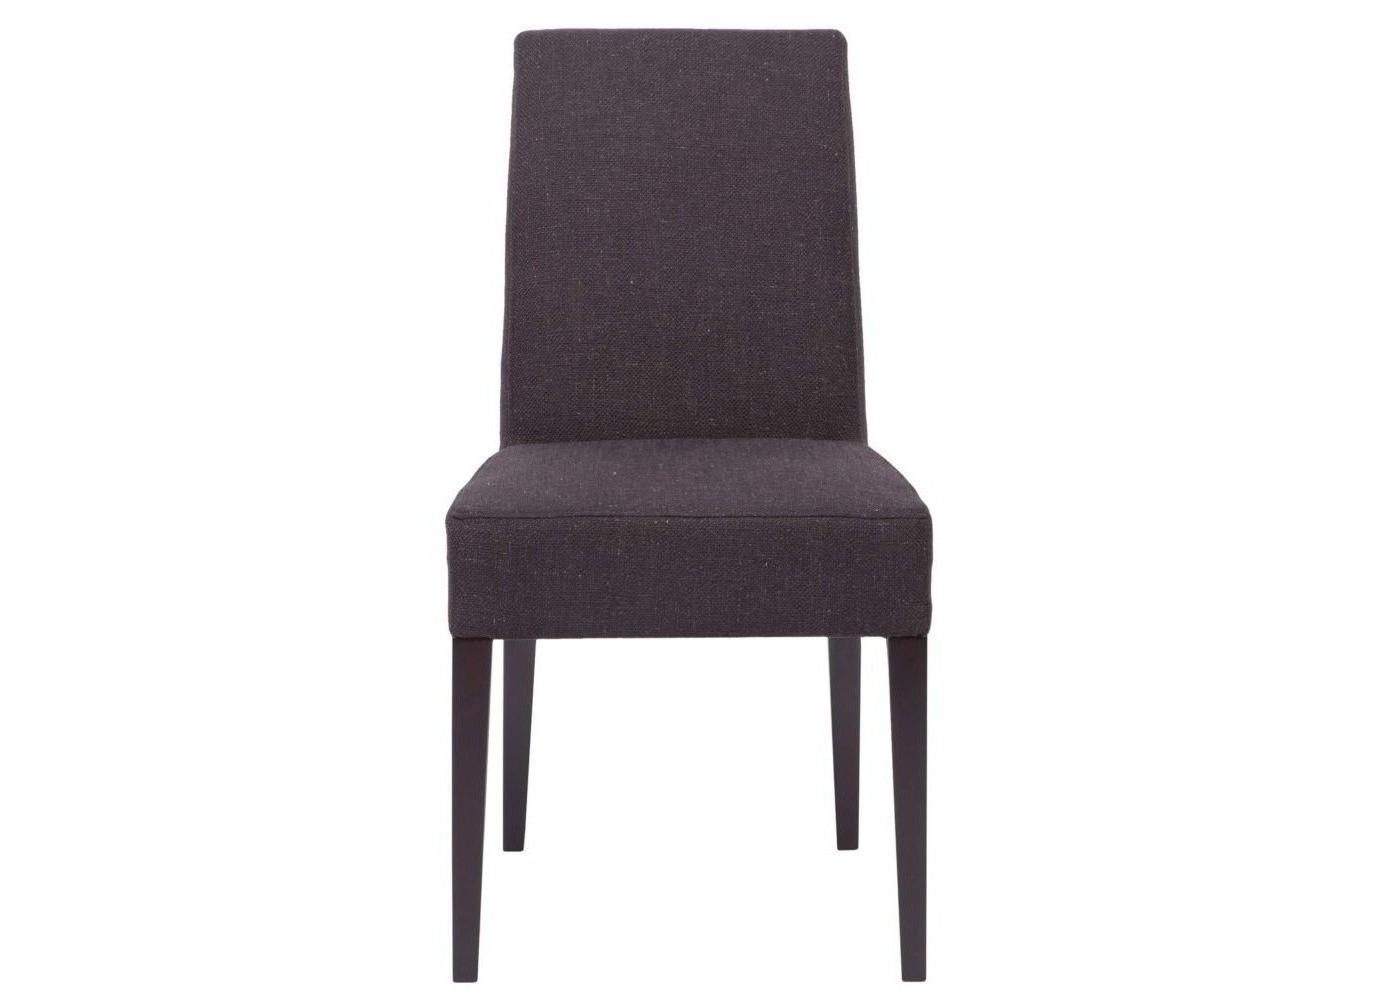 Кухонный стул M-Style 15442027 от thefurnish